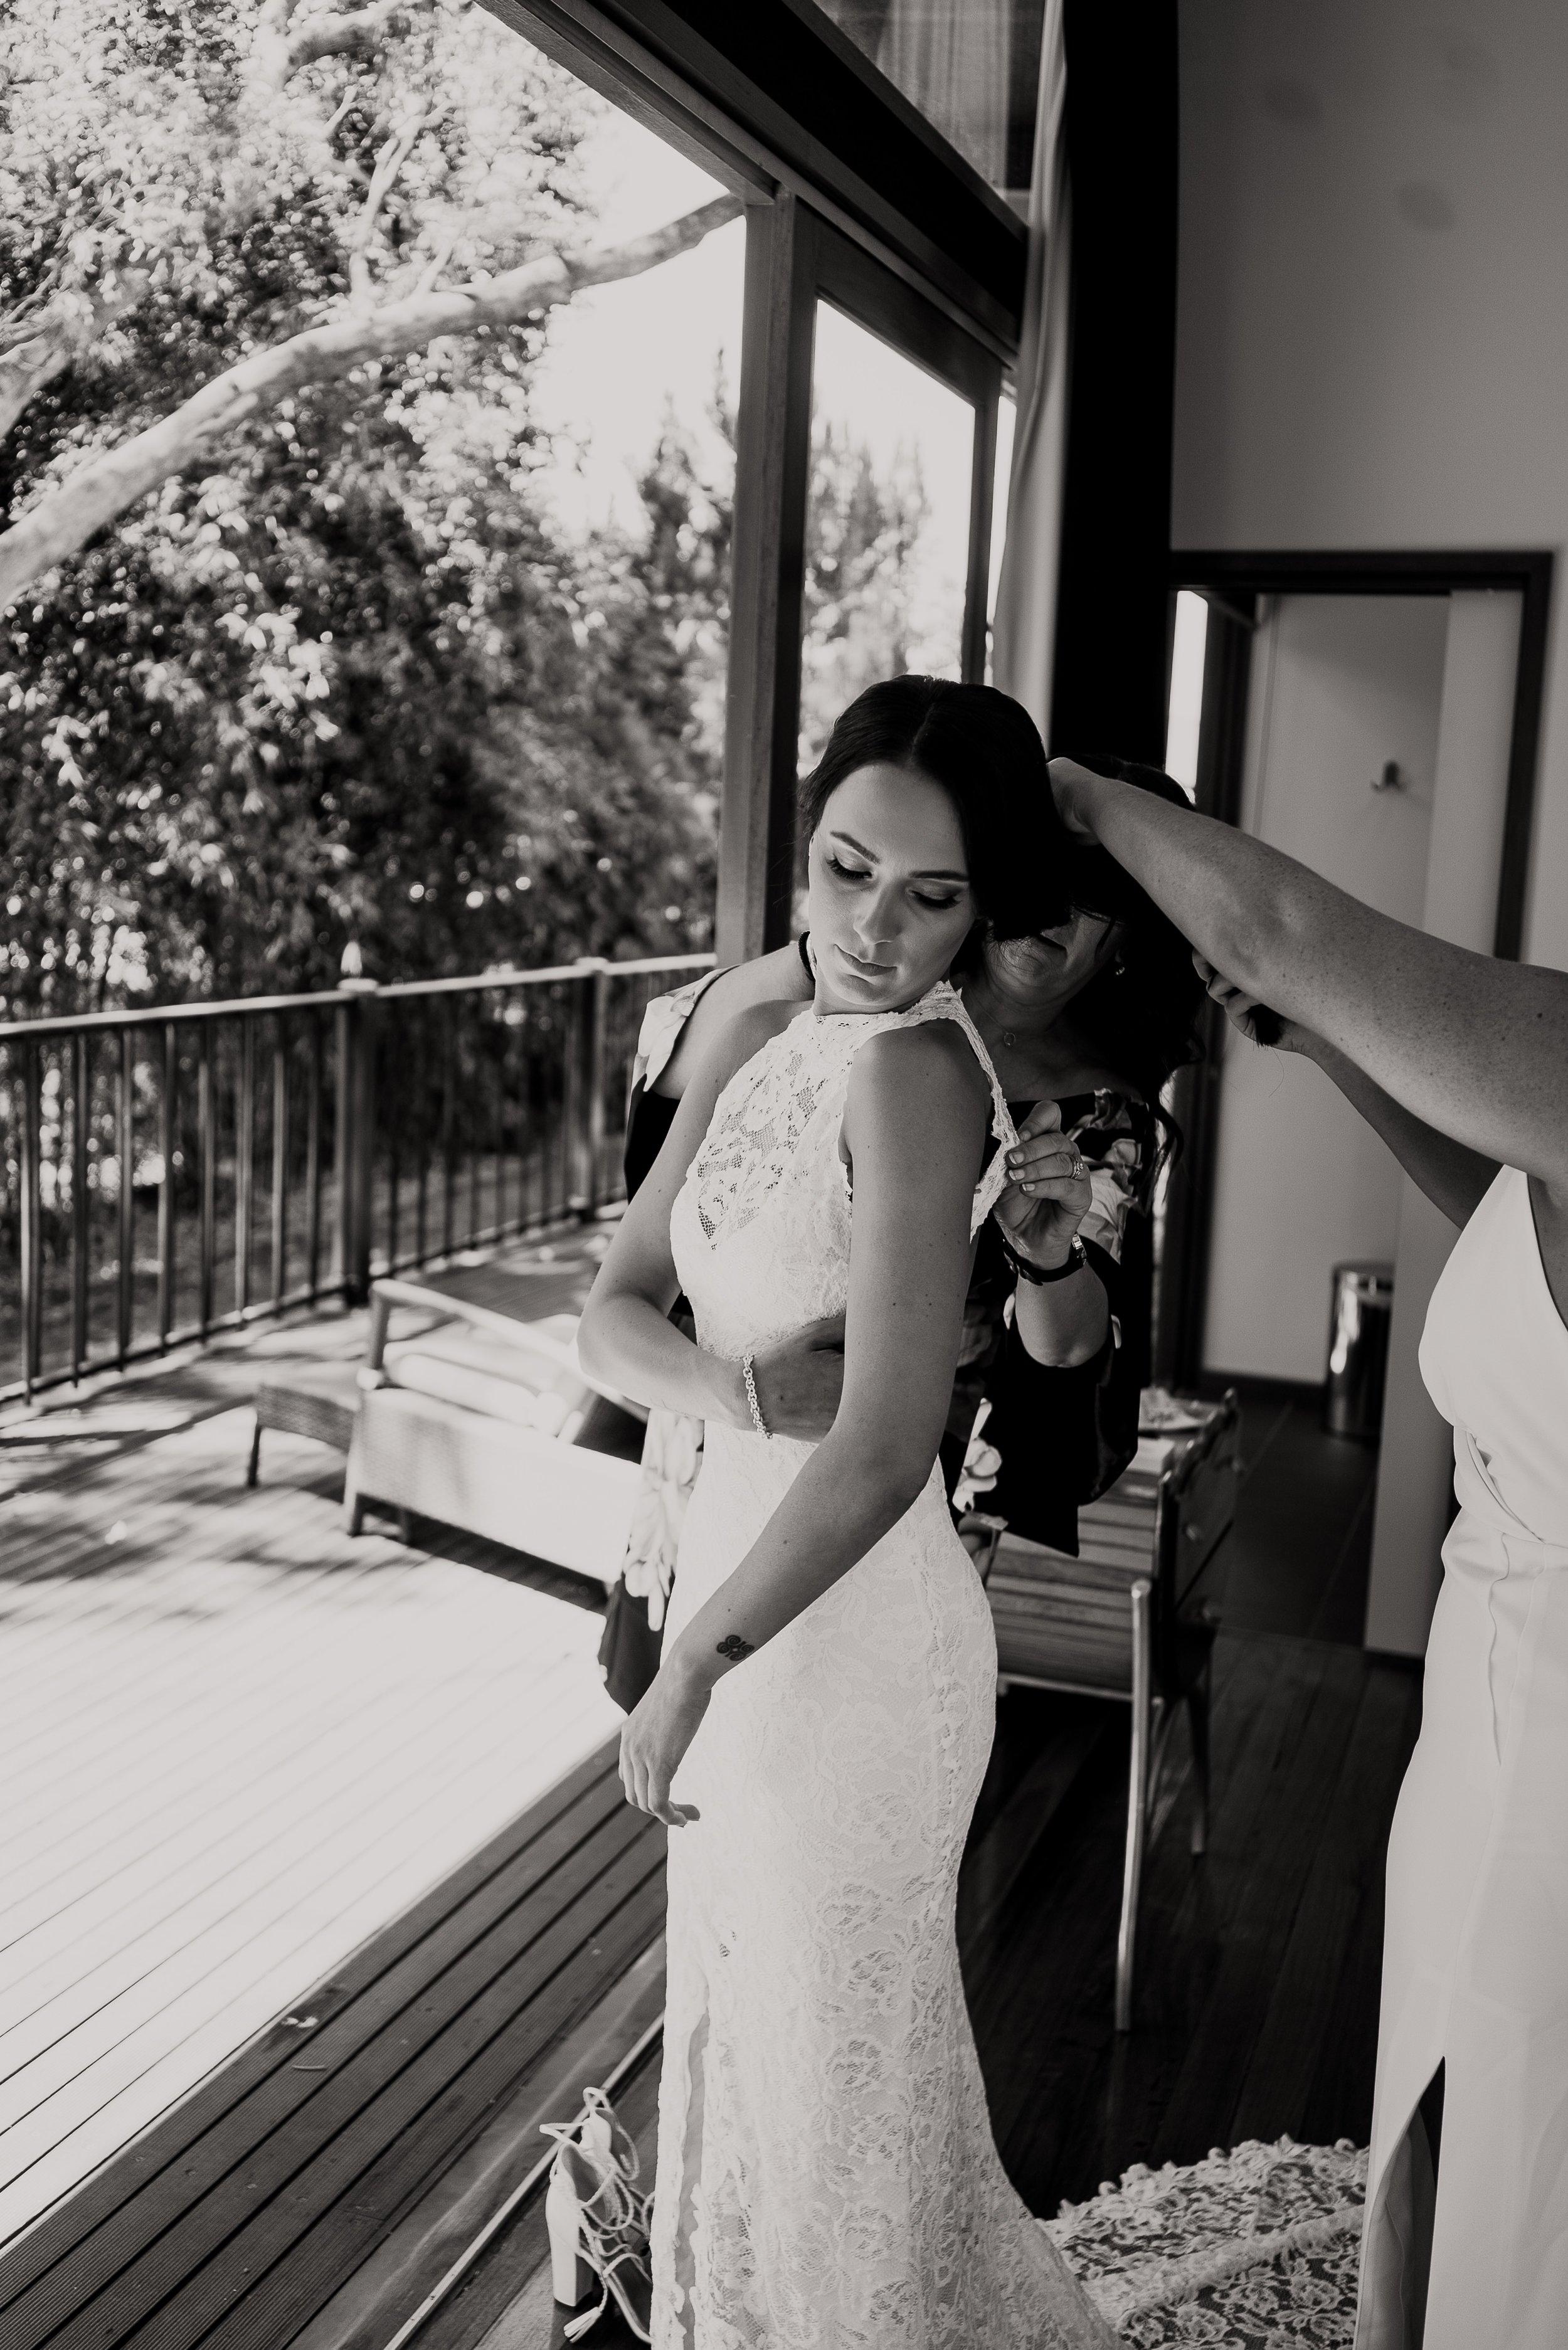 mickalathomas_puremacphotography_weddingphotographer_couplephotographer_Sheppartonphotographer_2701.jpg